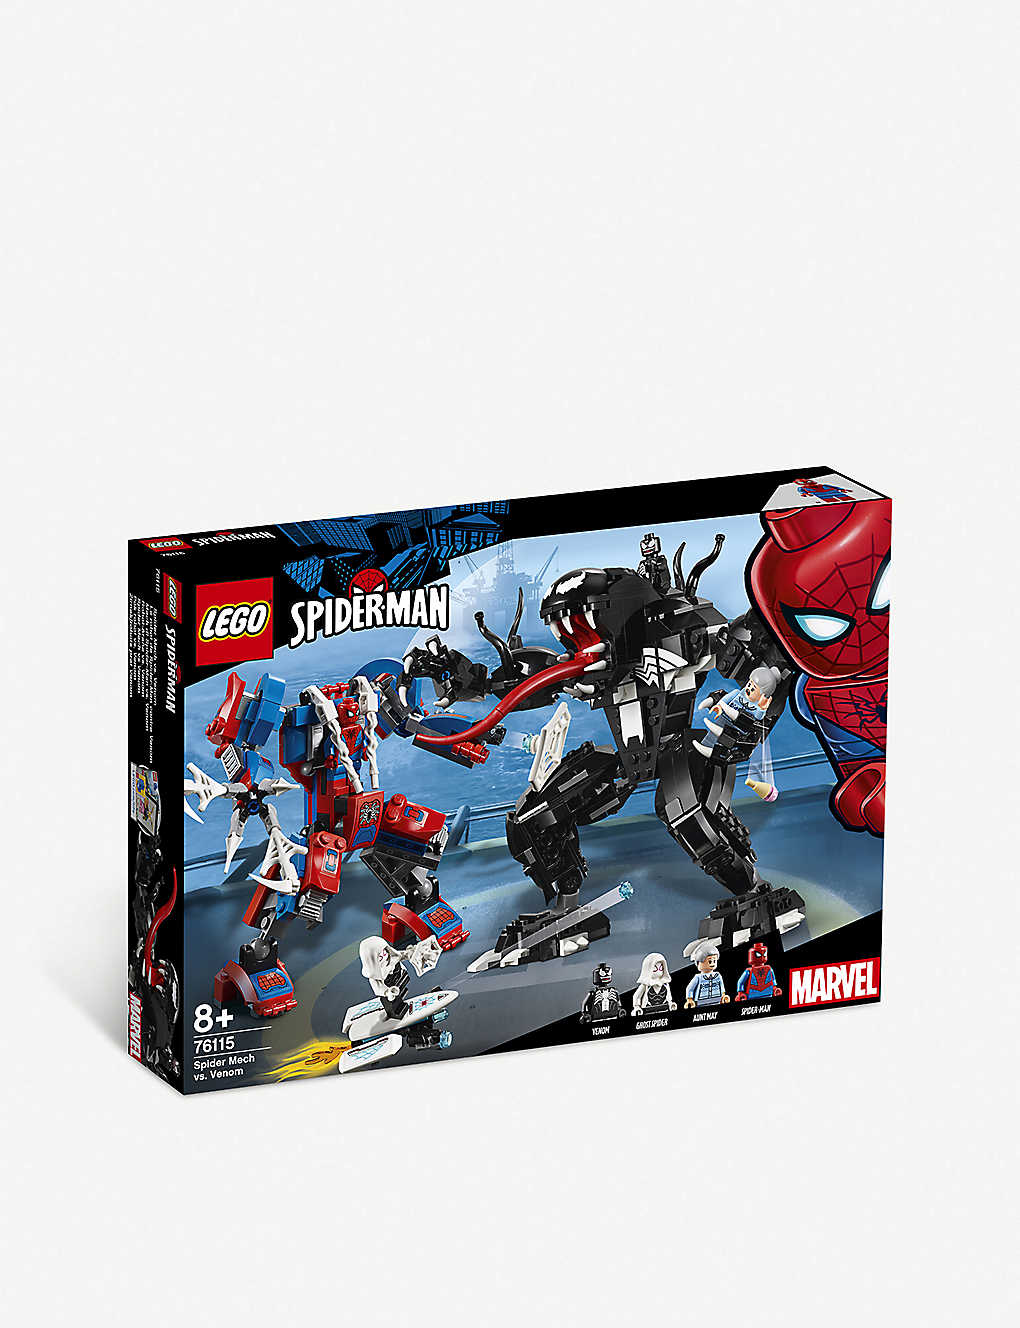 0cec9f1cb LEGO - Marvel Super Heroes Spiderman Spider Mech vs. Venom play set ...